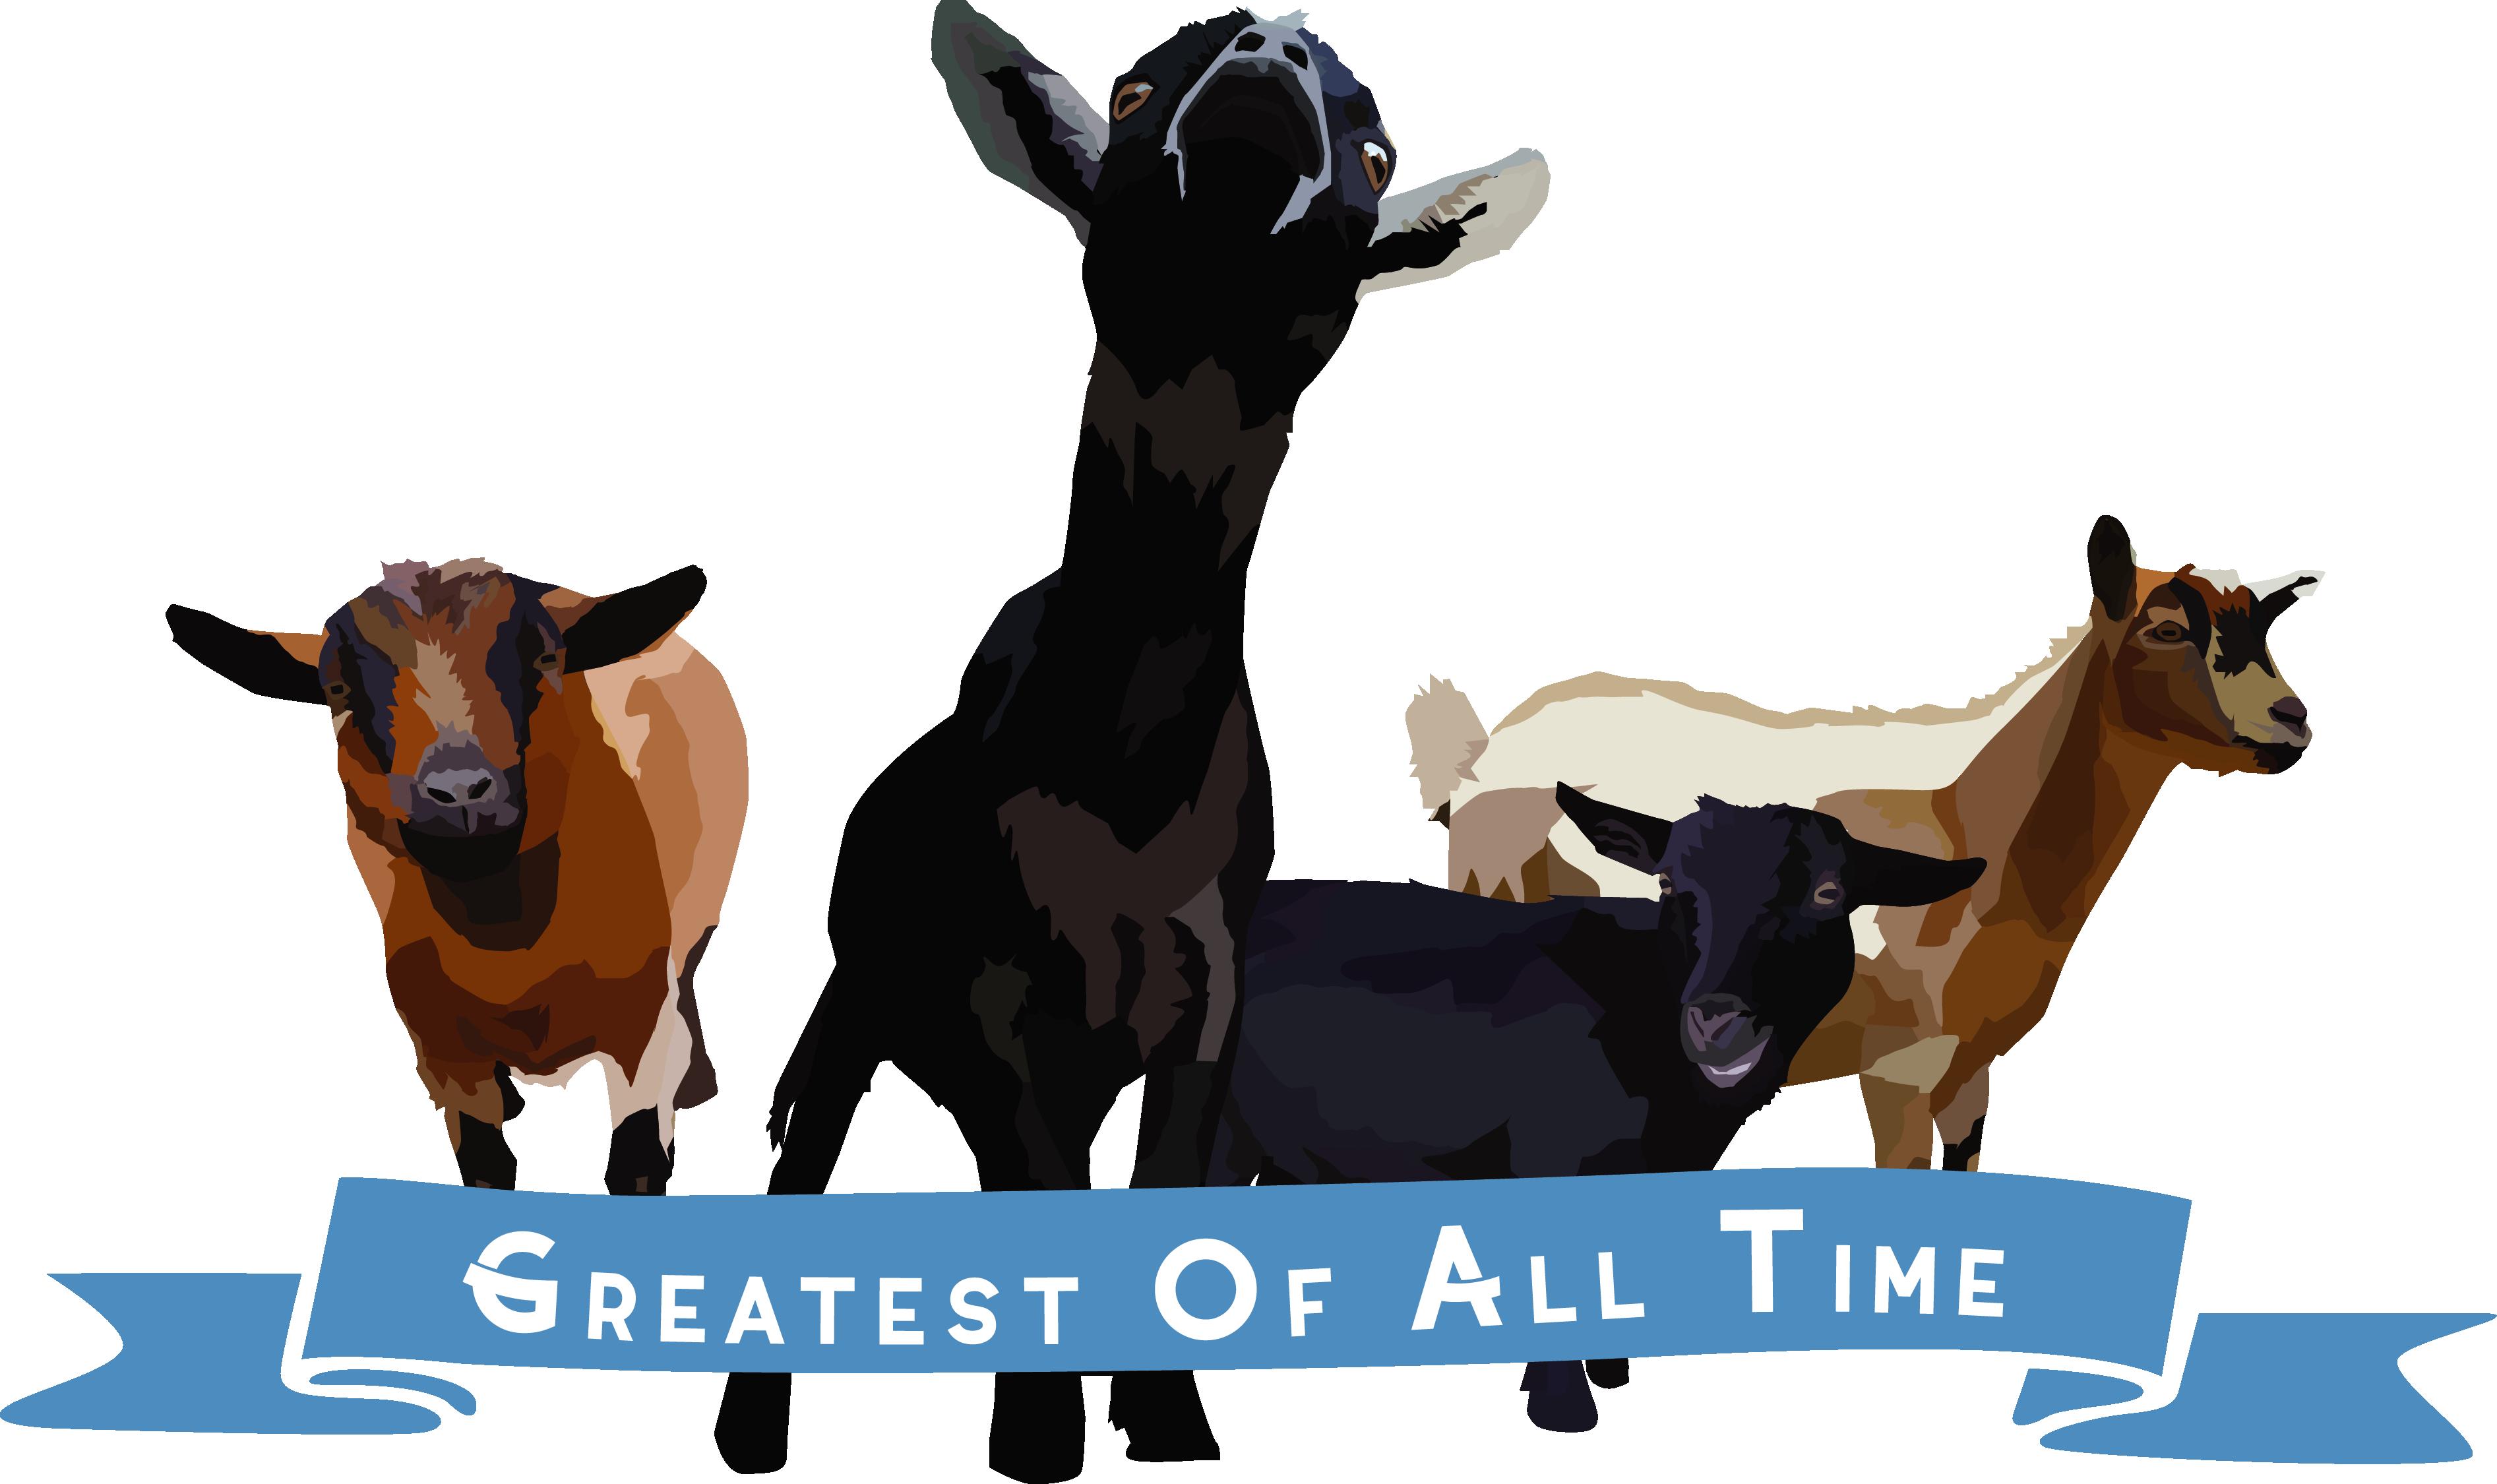 Goats-illustrated-01